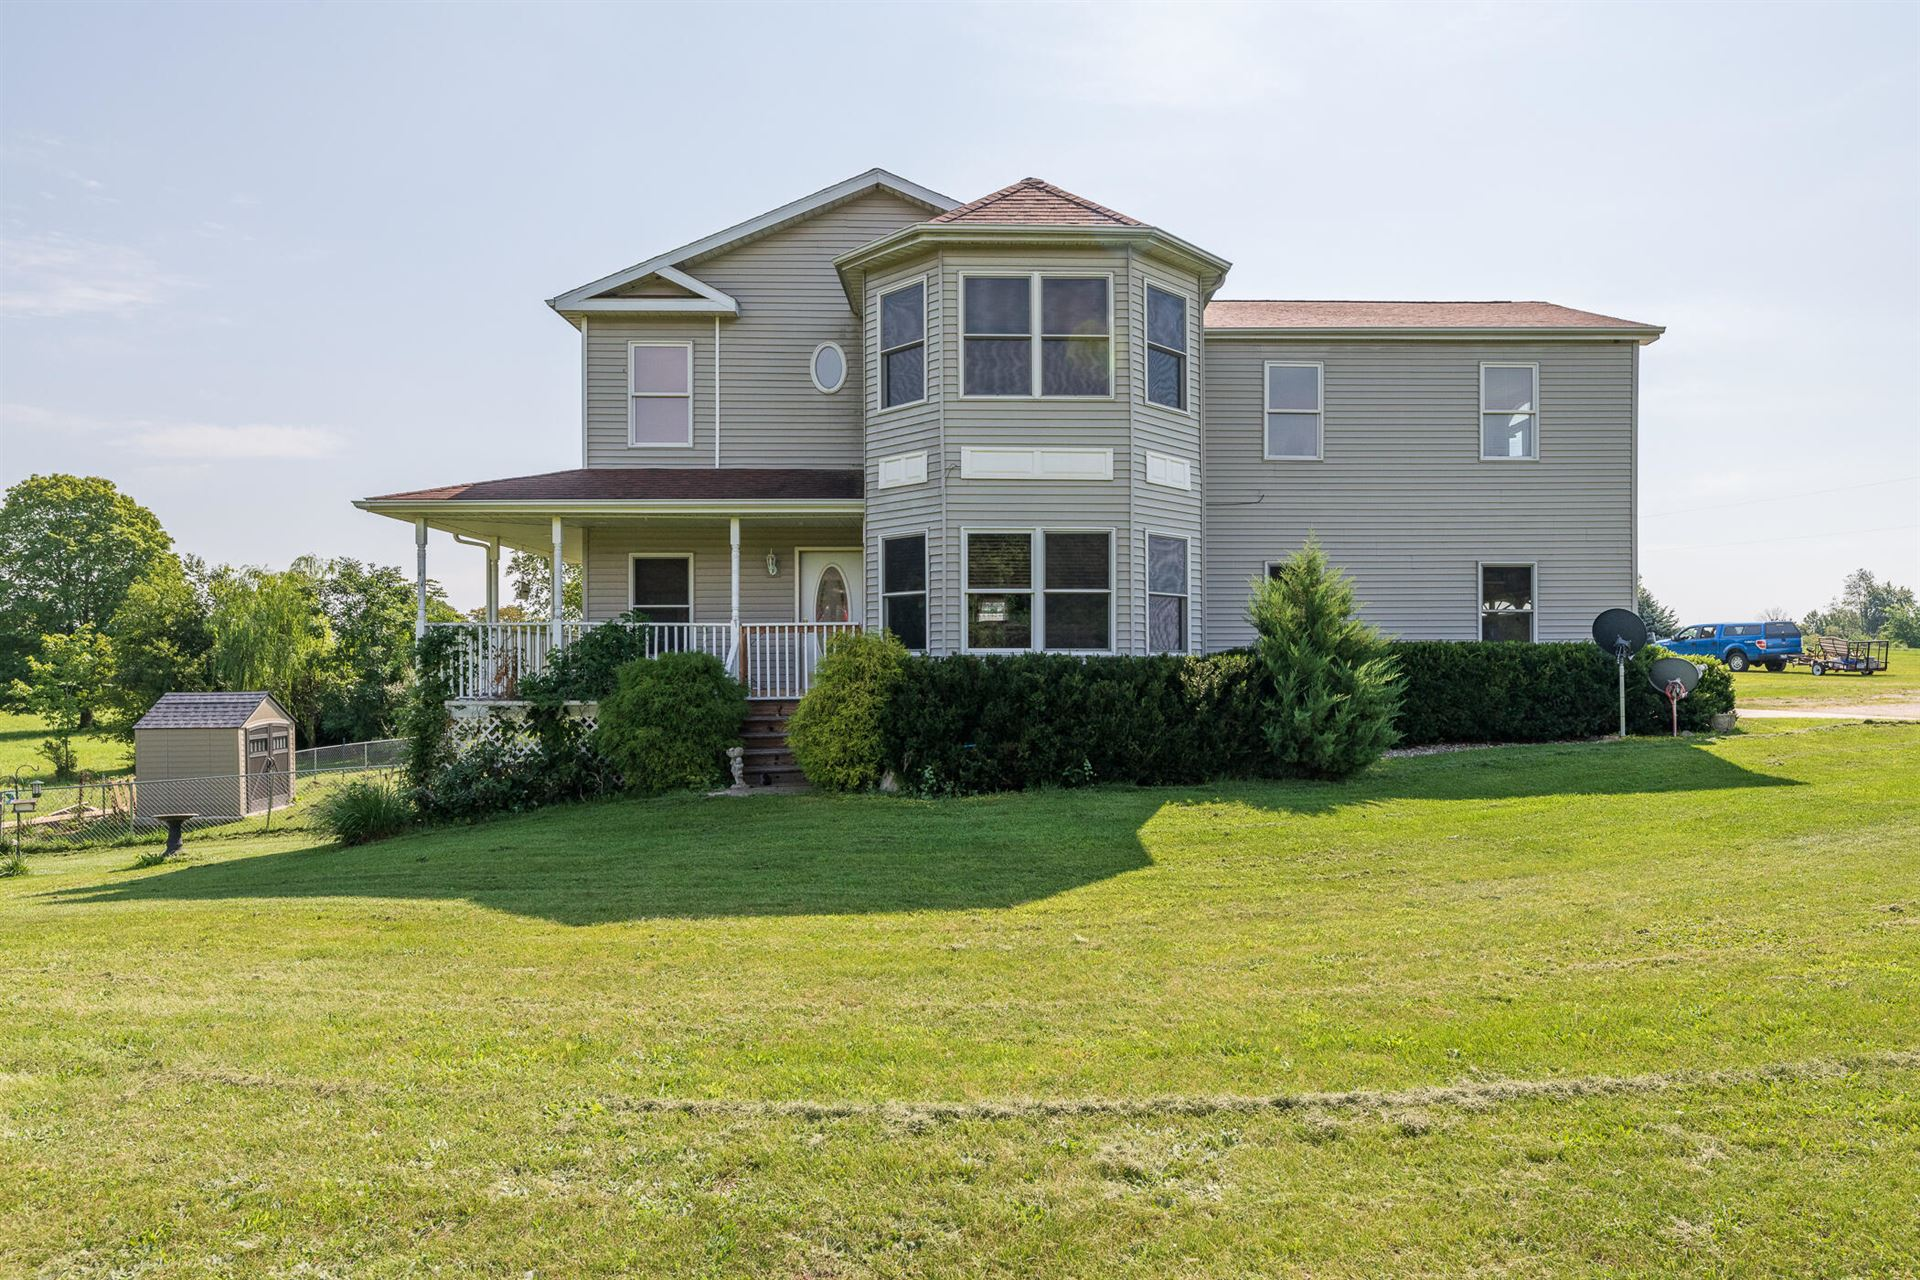 2303 Hillandale Road, Benton Harbor, MI 49022 - MLS#: 21102251